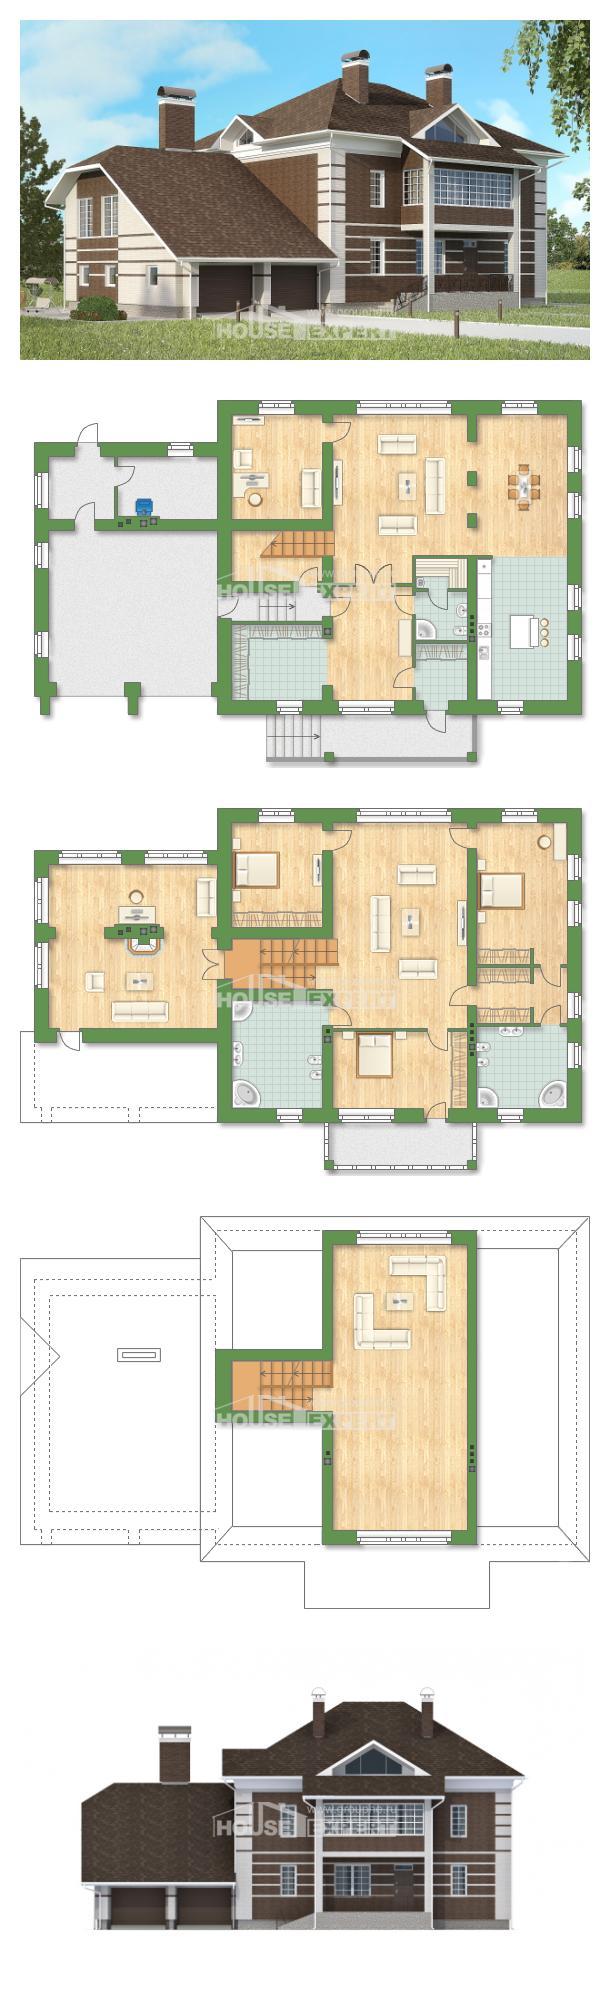 Proyecto de casa 505-002-L   House Expert